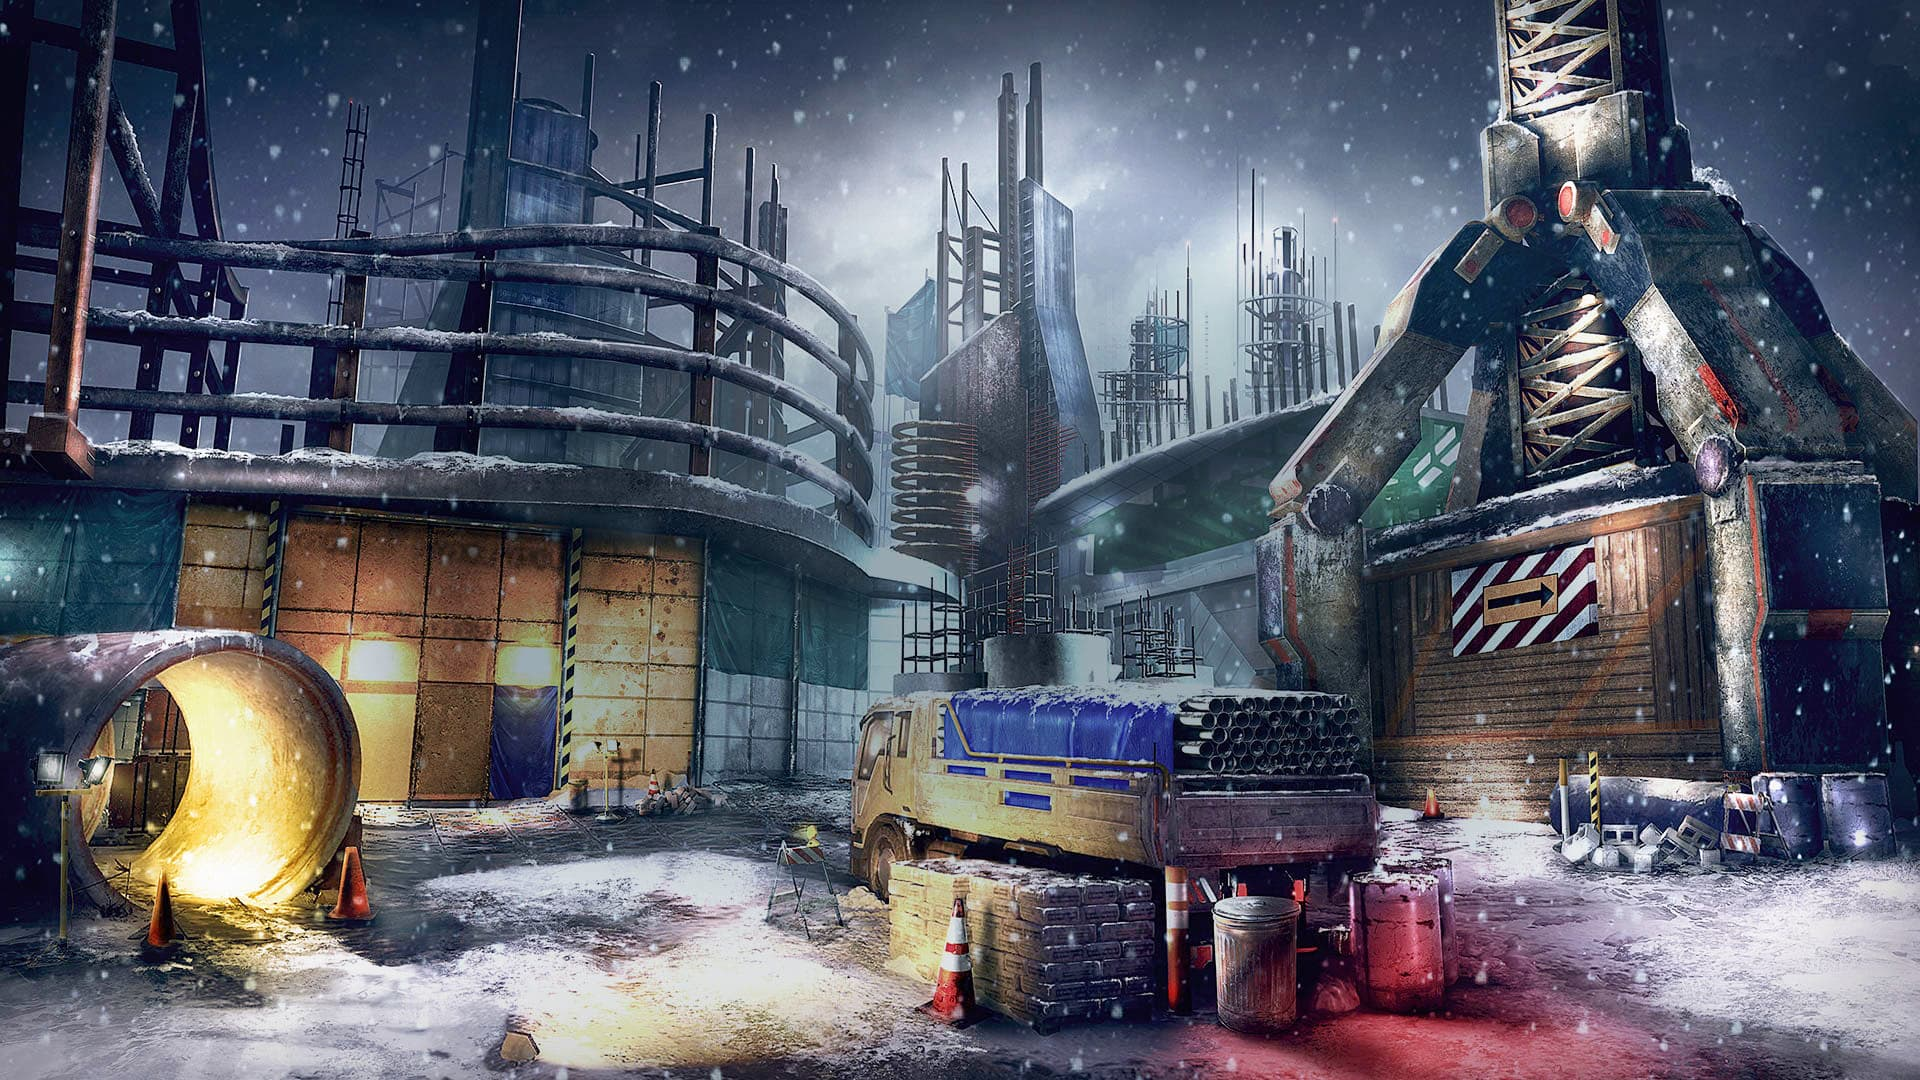 Call oph Duty: Black Ops III - Awakening